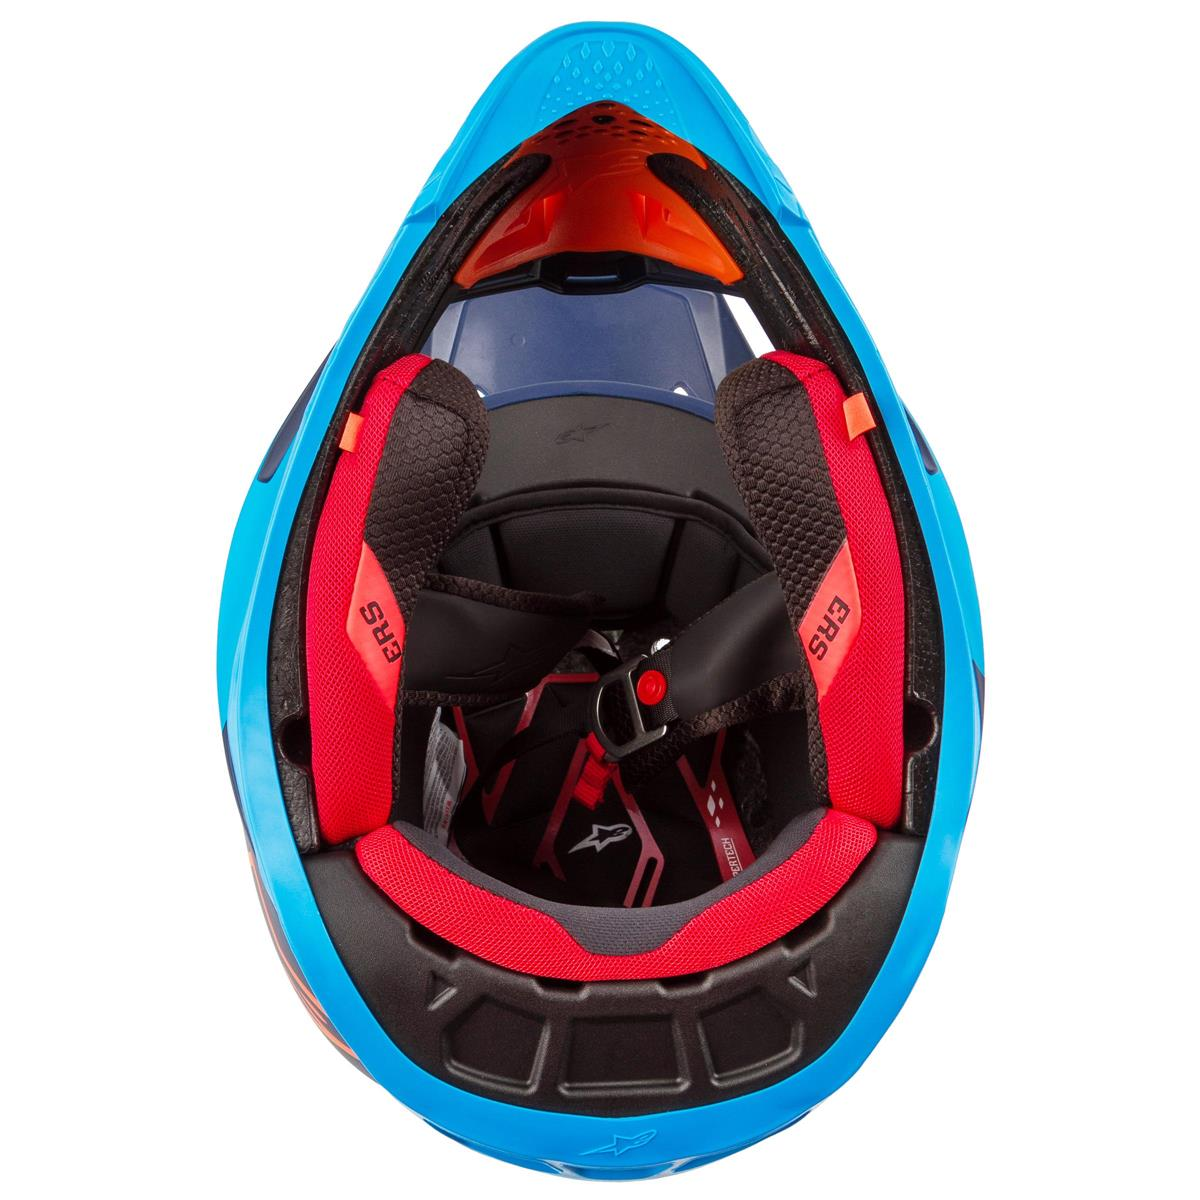 alpinestars-helm-helmet-supertech-s-m10-7 (1)